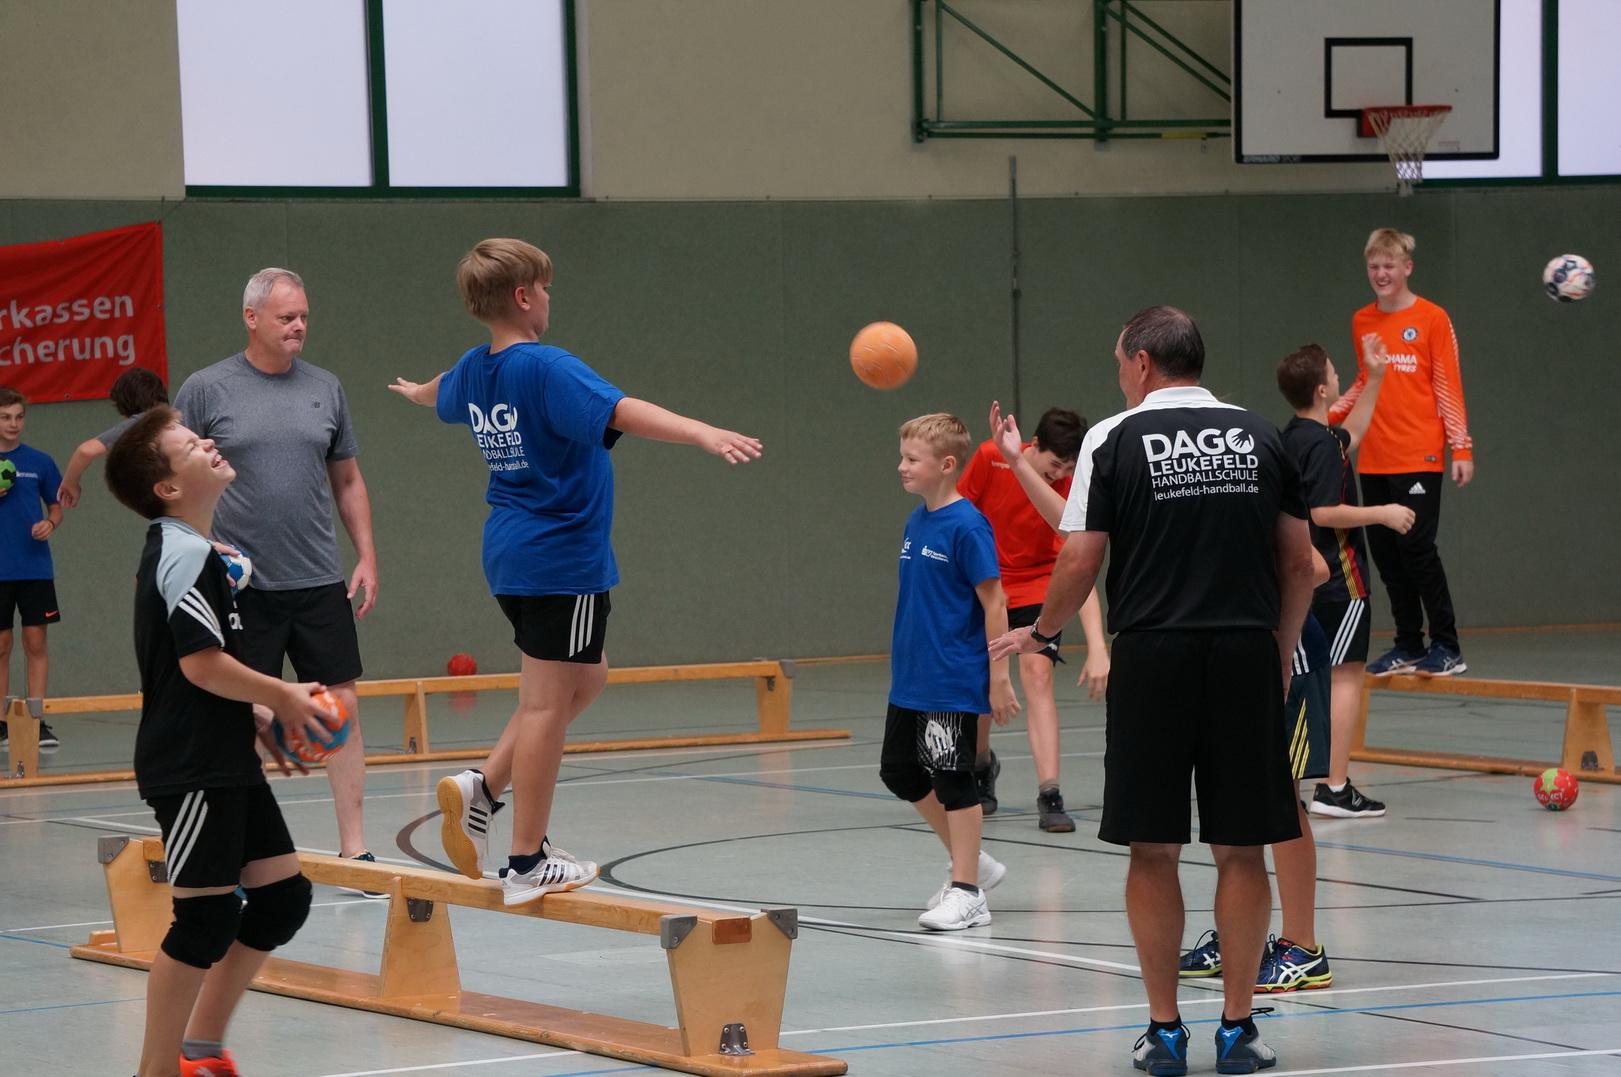 201808_Handballcamp_SDH_MG_180w